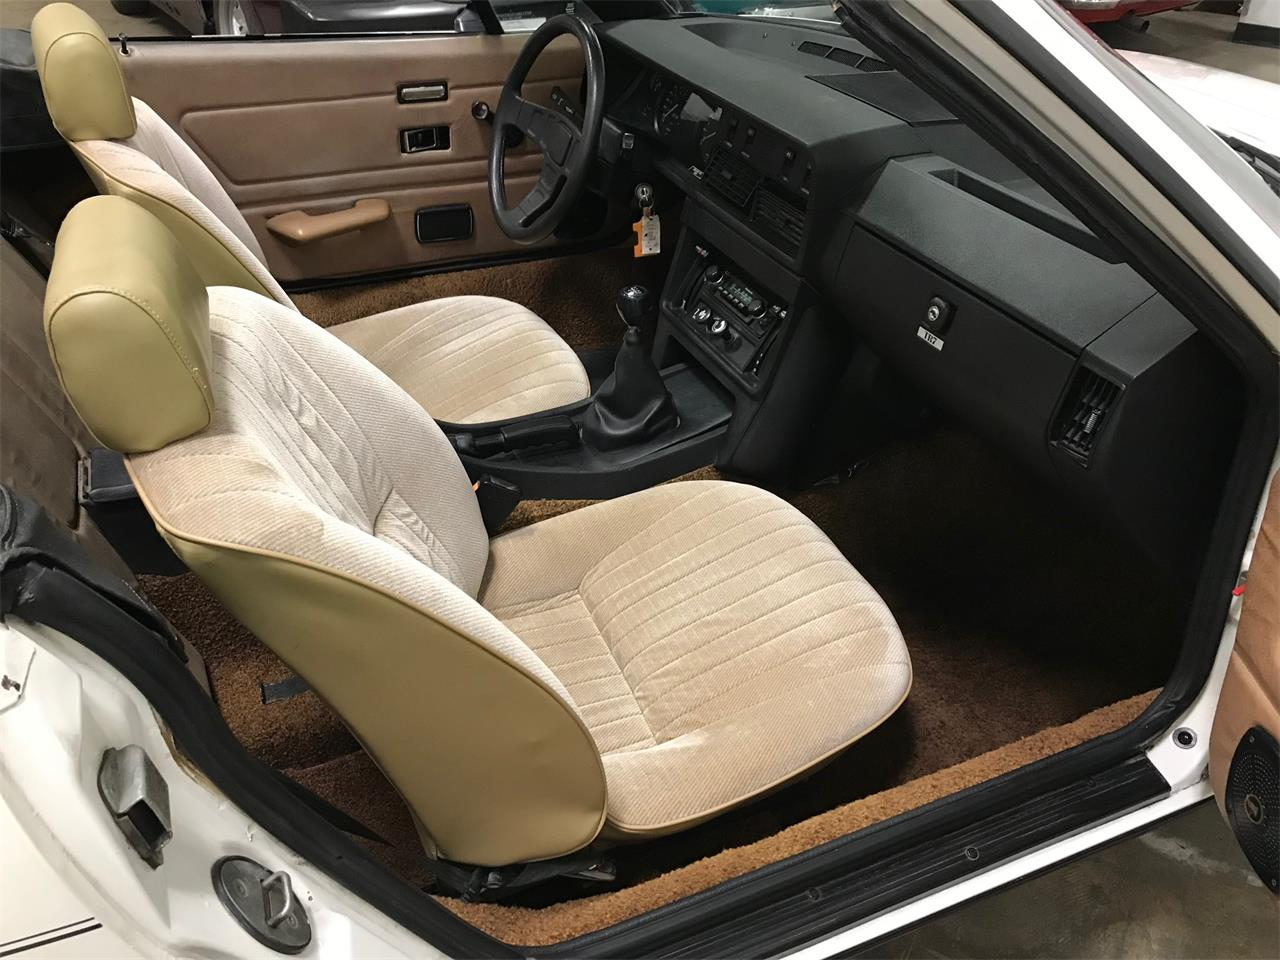 Large Picture of '79 Triumph TR7 located in Cleveland Ohio - $7,950.00 - Q5UK